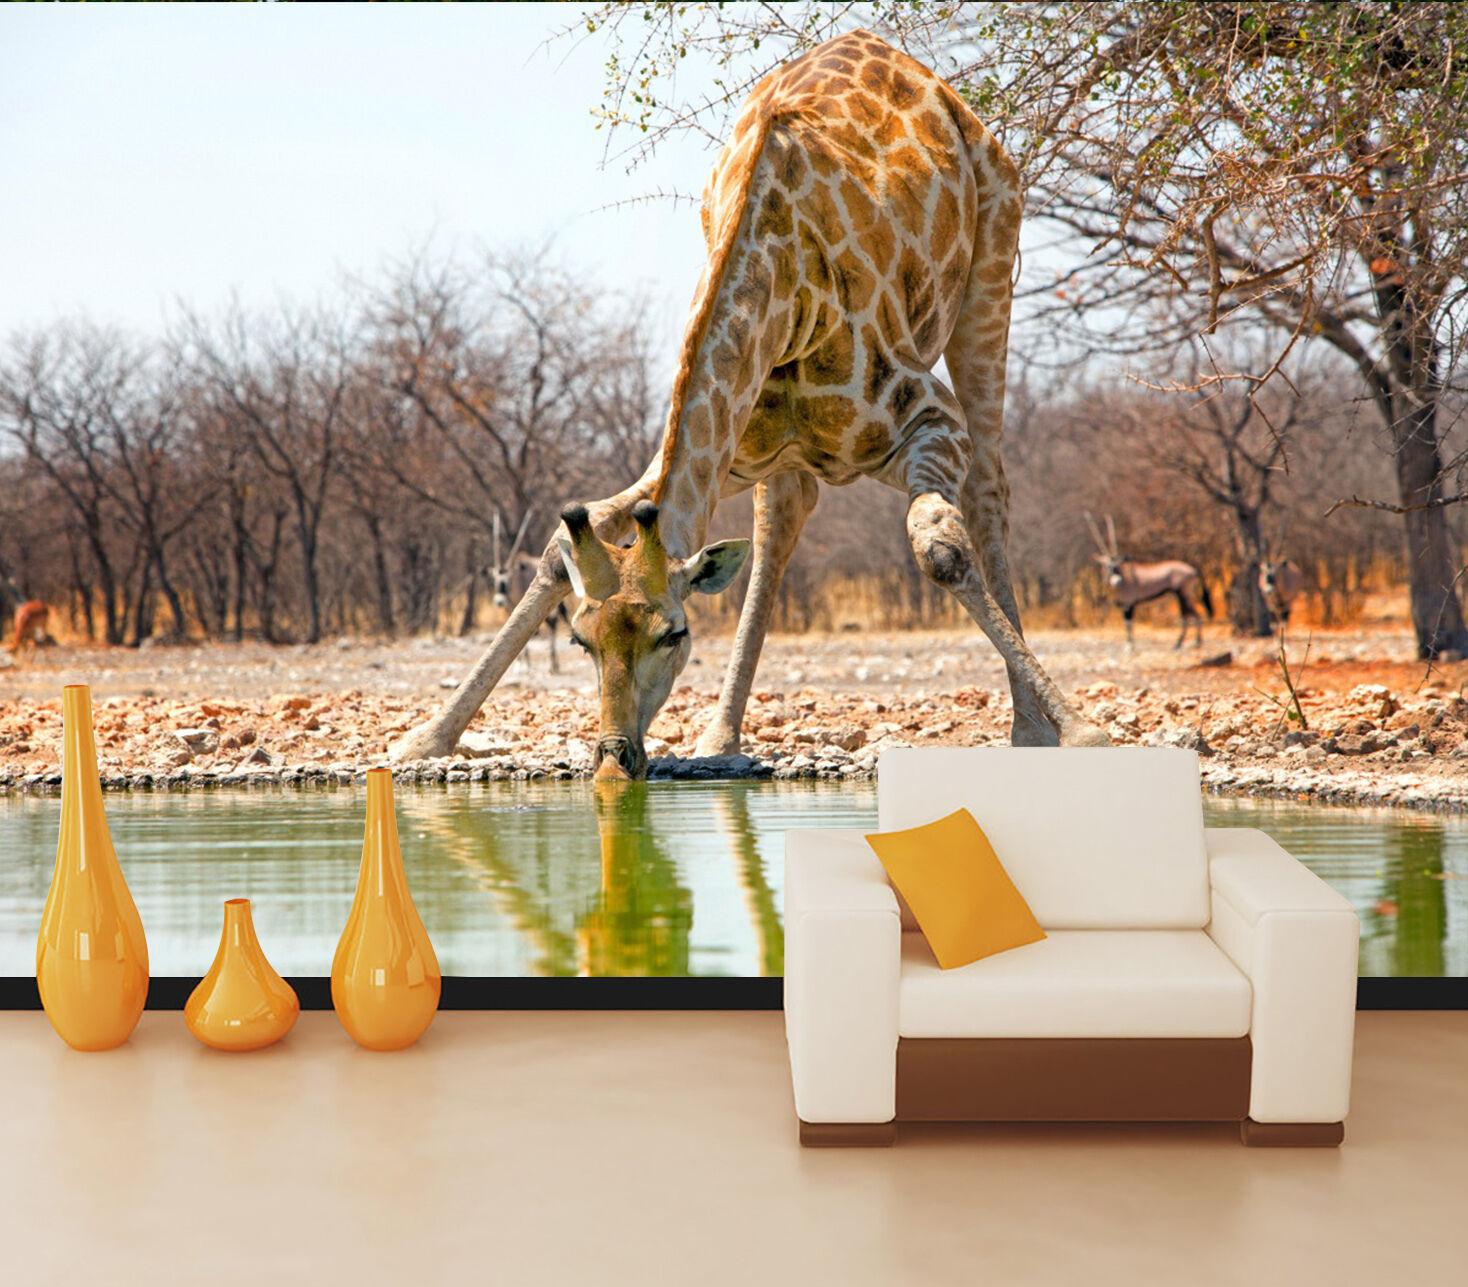 3D Elegant Giraffe 80 WallPaper Murals Wall Print Decal Wall Deco AJ WALLPAPER